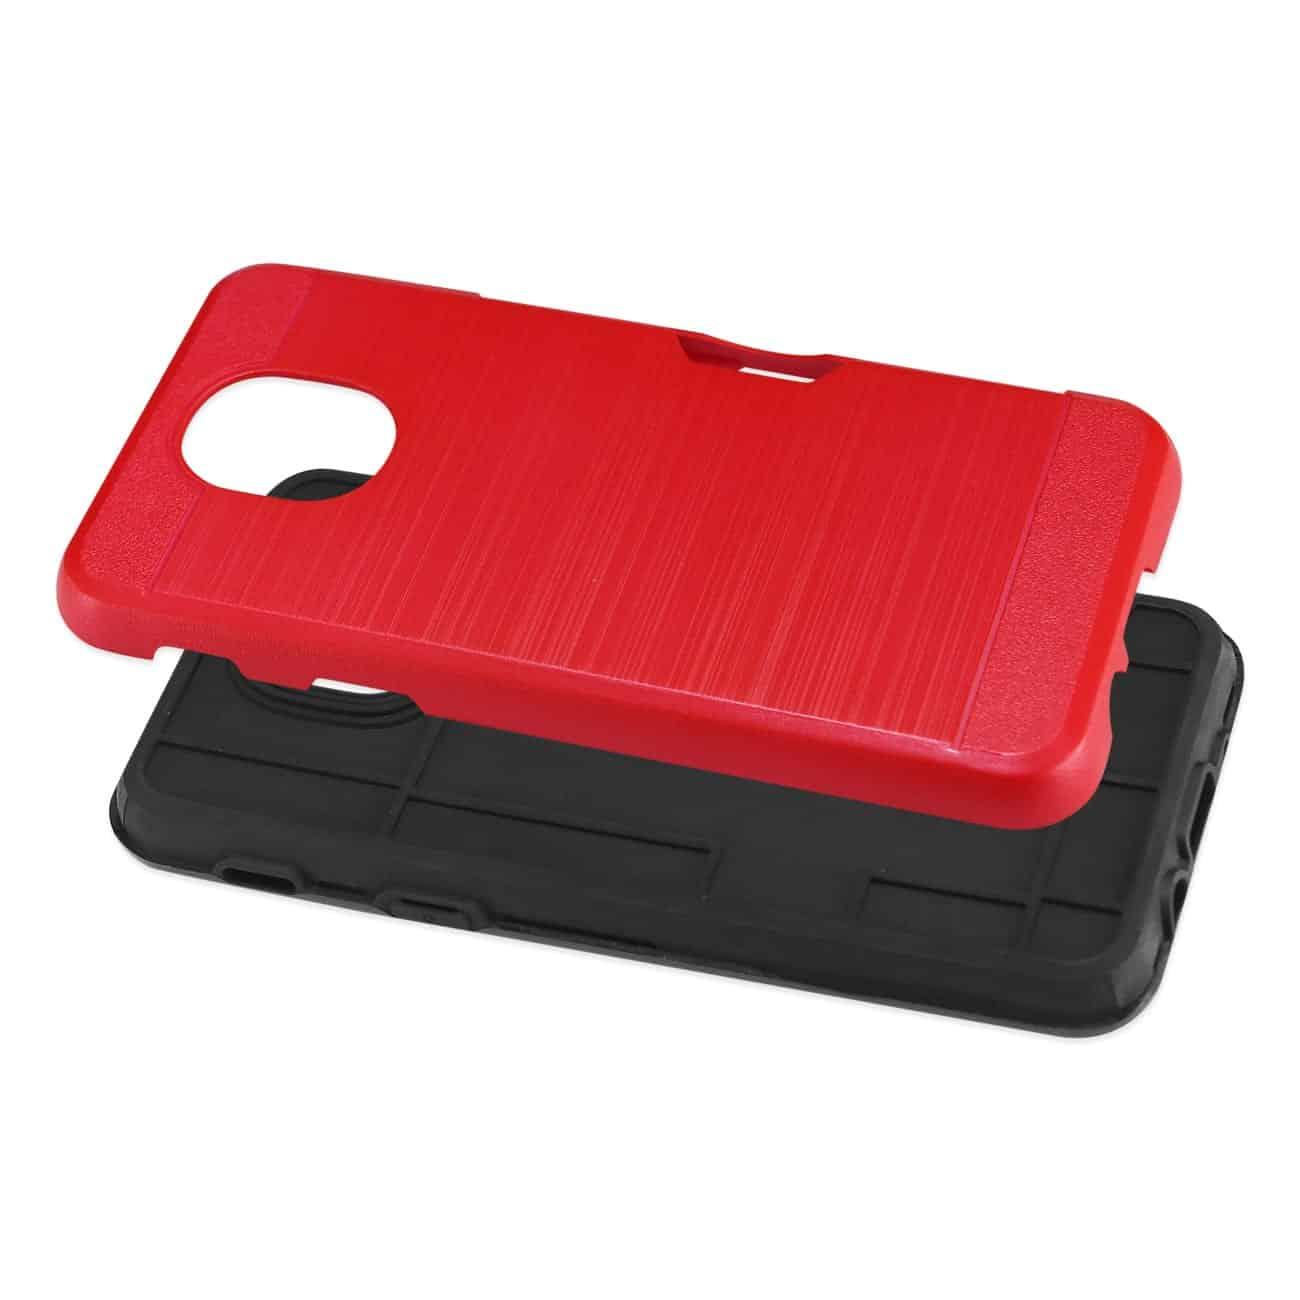 Samsung J7(2018) Slim Armor Hybrid Case With Card Holder In Red